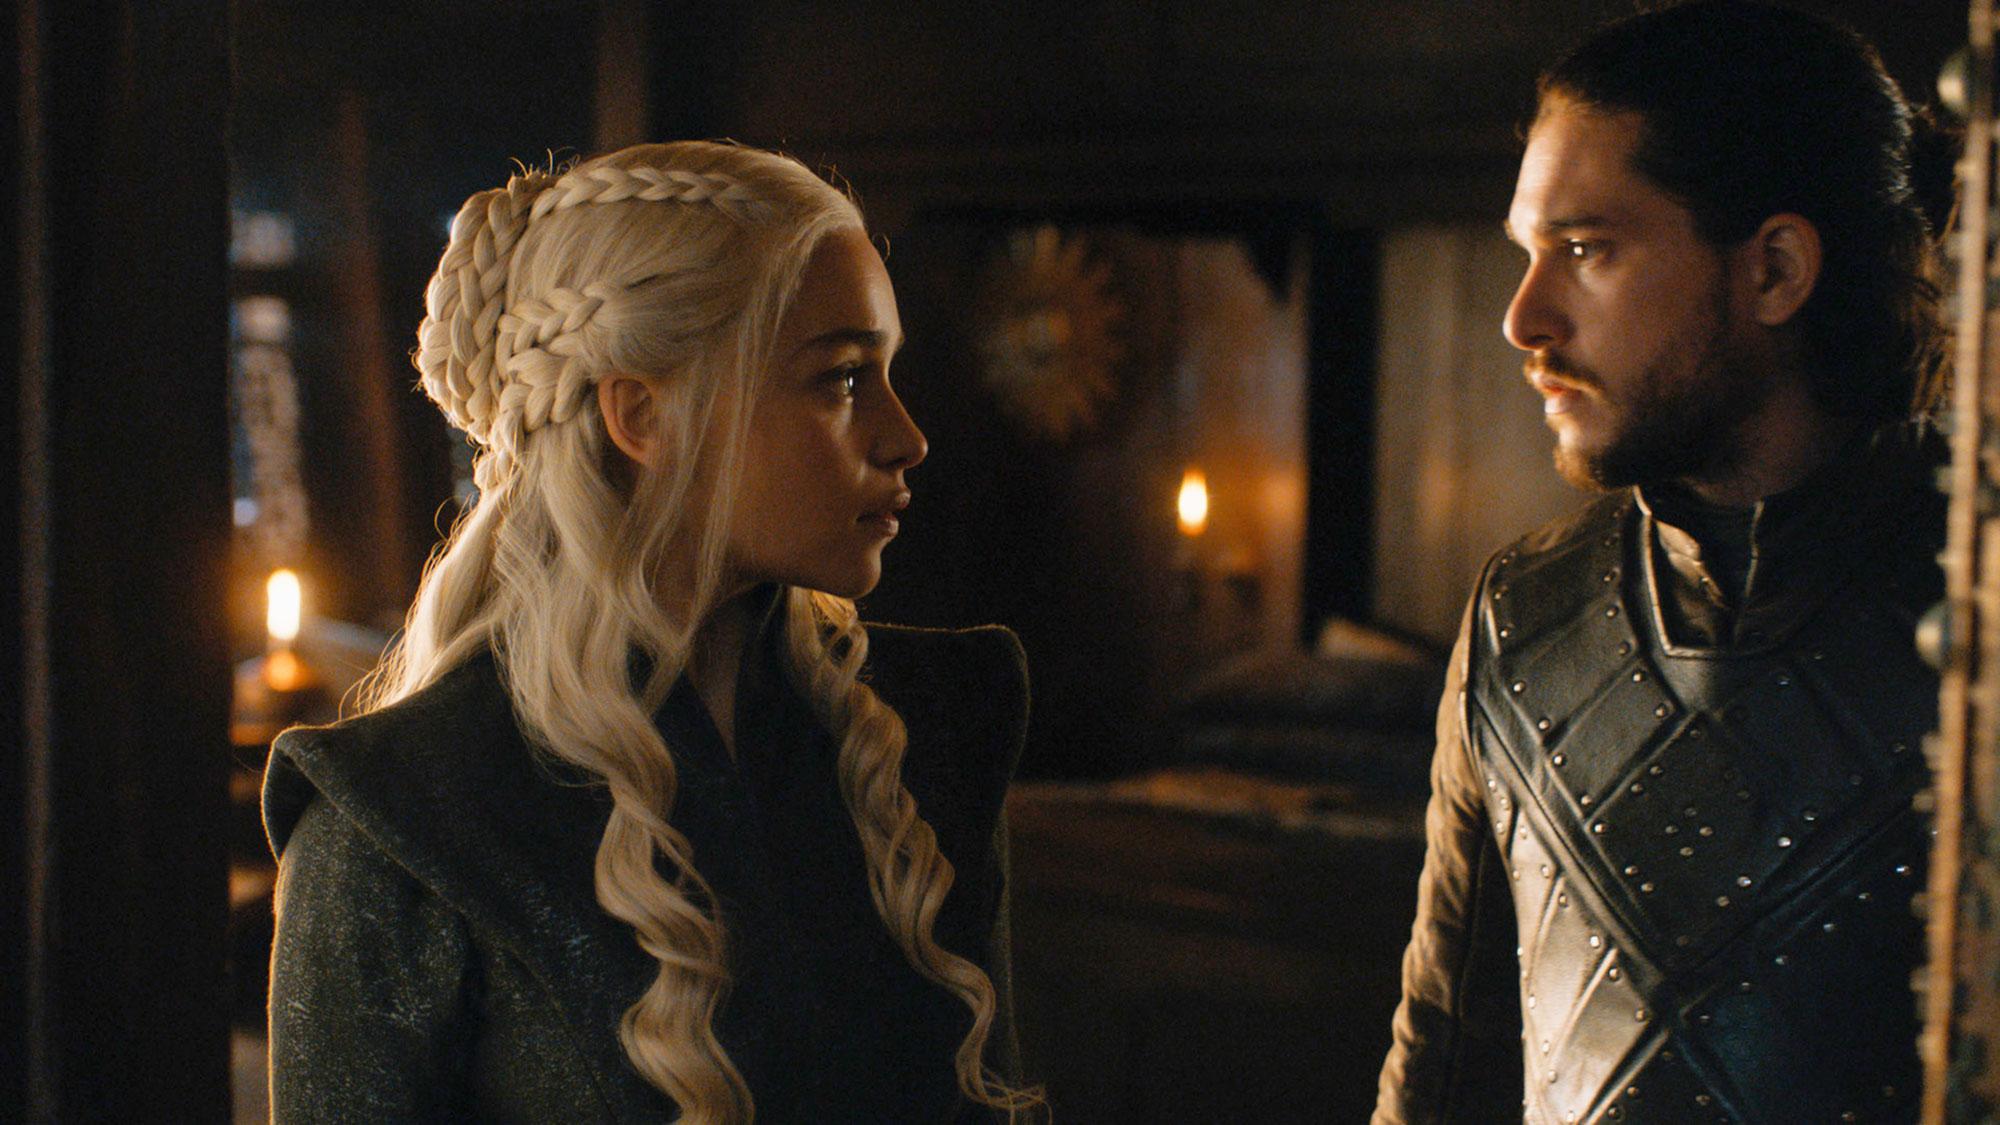 Game of Thrones braids hairstyles hair Emilia Clarke, Kit Harington - For a warrior-worthy twist on a classic ballerina bun, Khaleesi wrapped several plaits around each other in season seven.